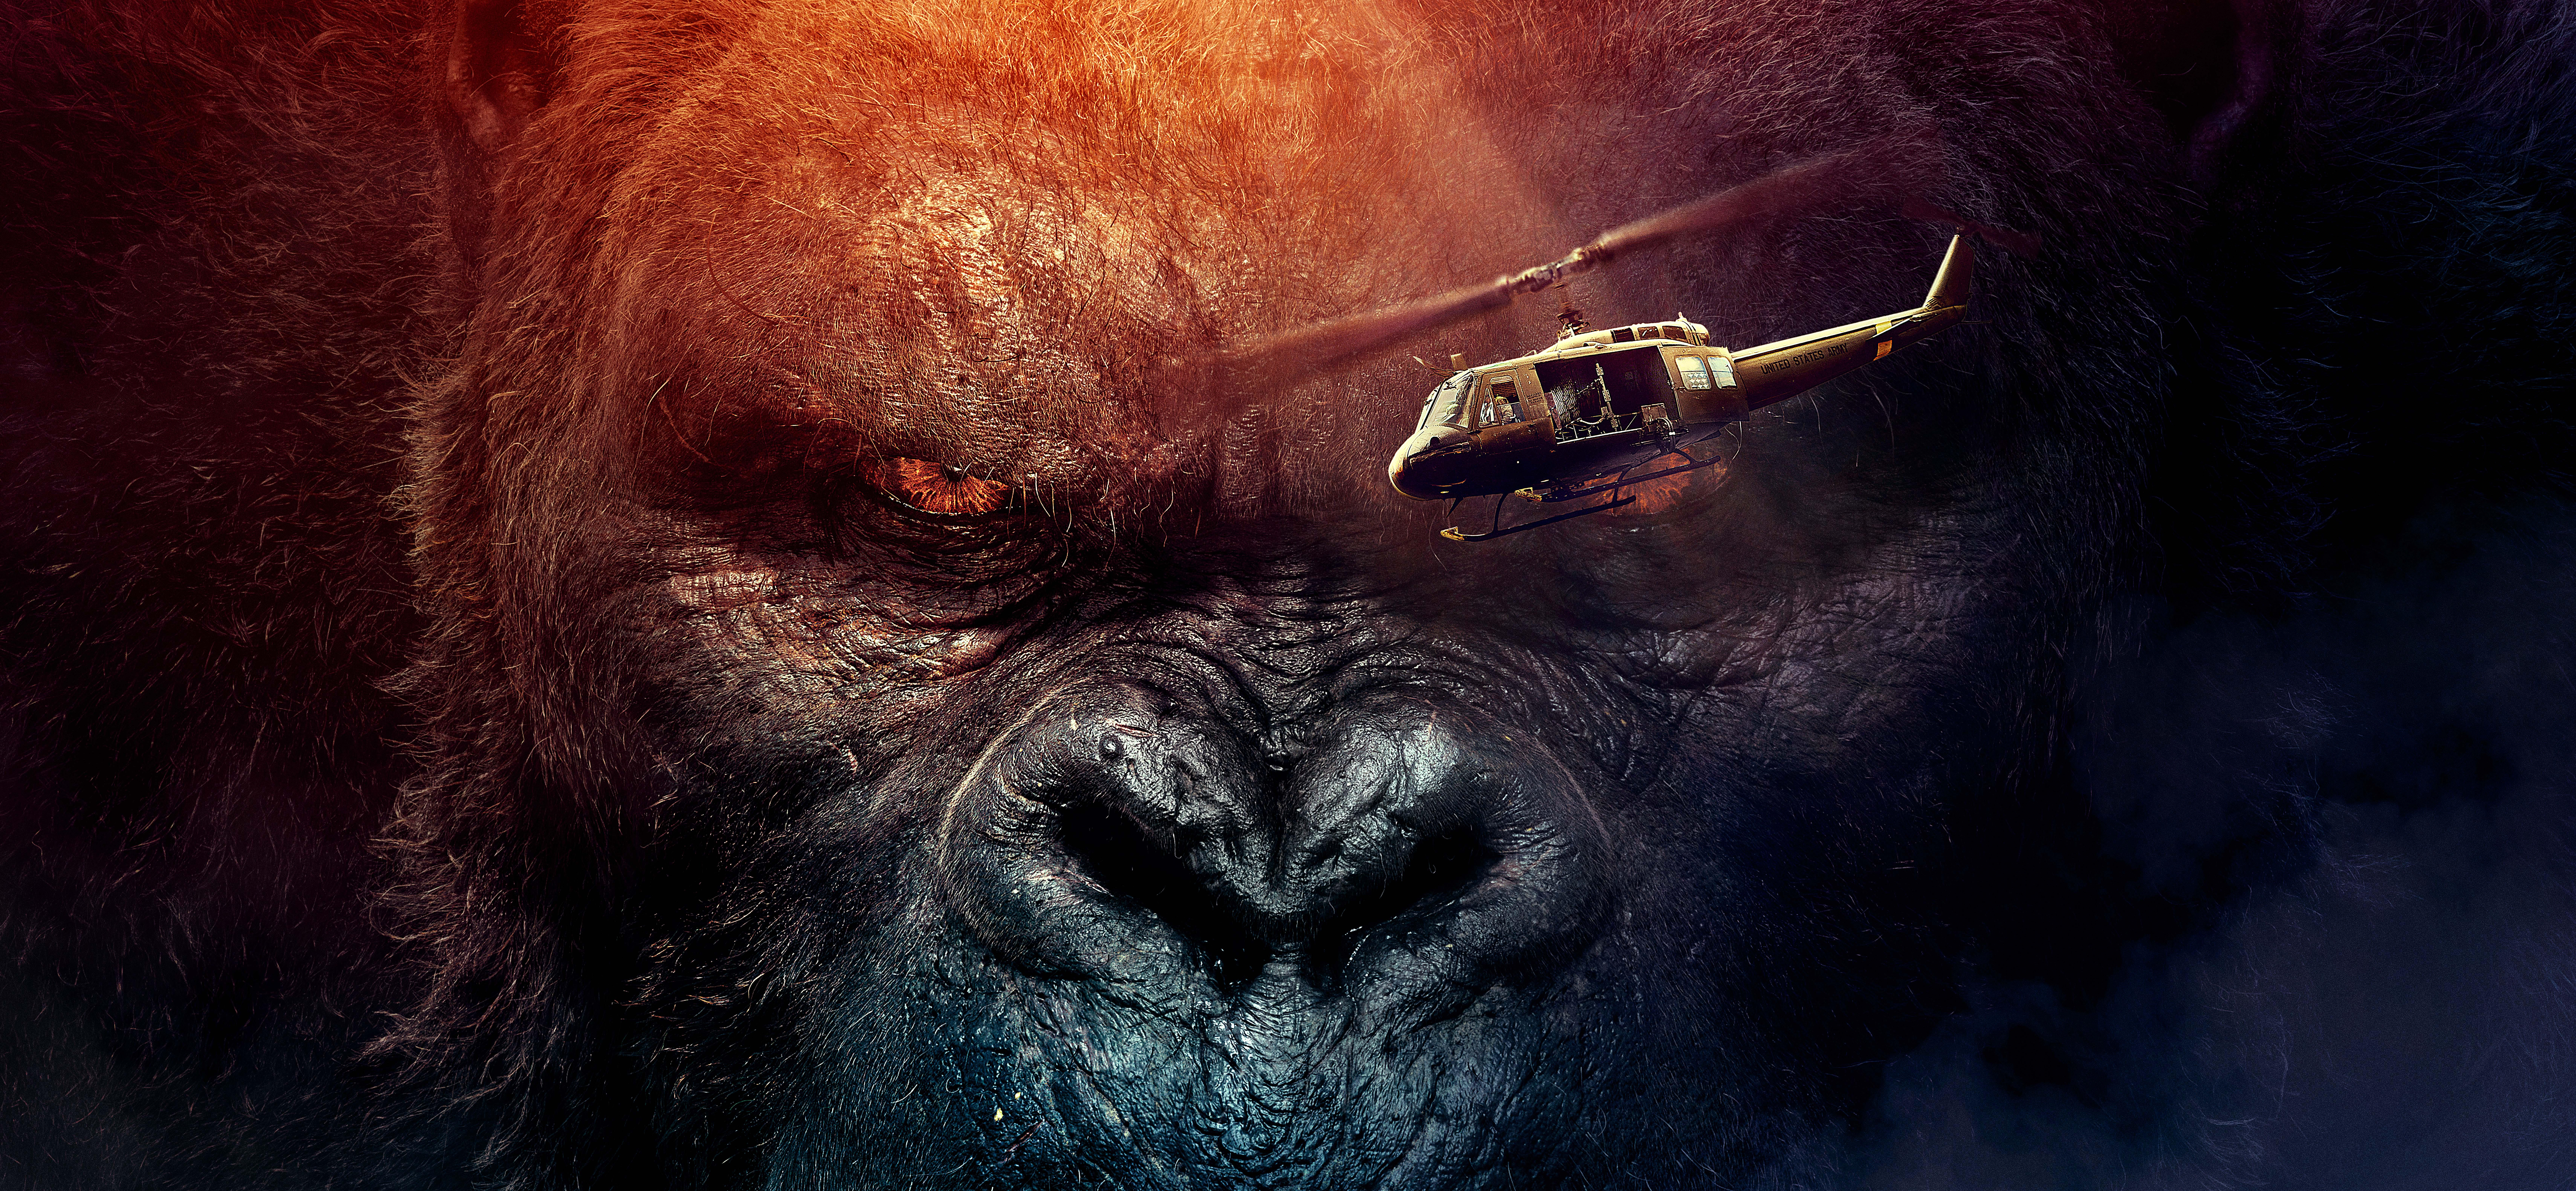 Kong: Skull Island 8k Ultra HD Wallpaper